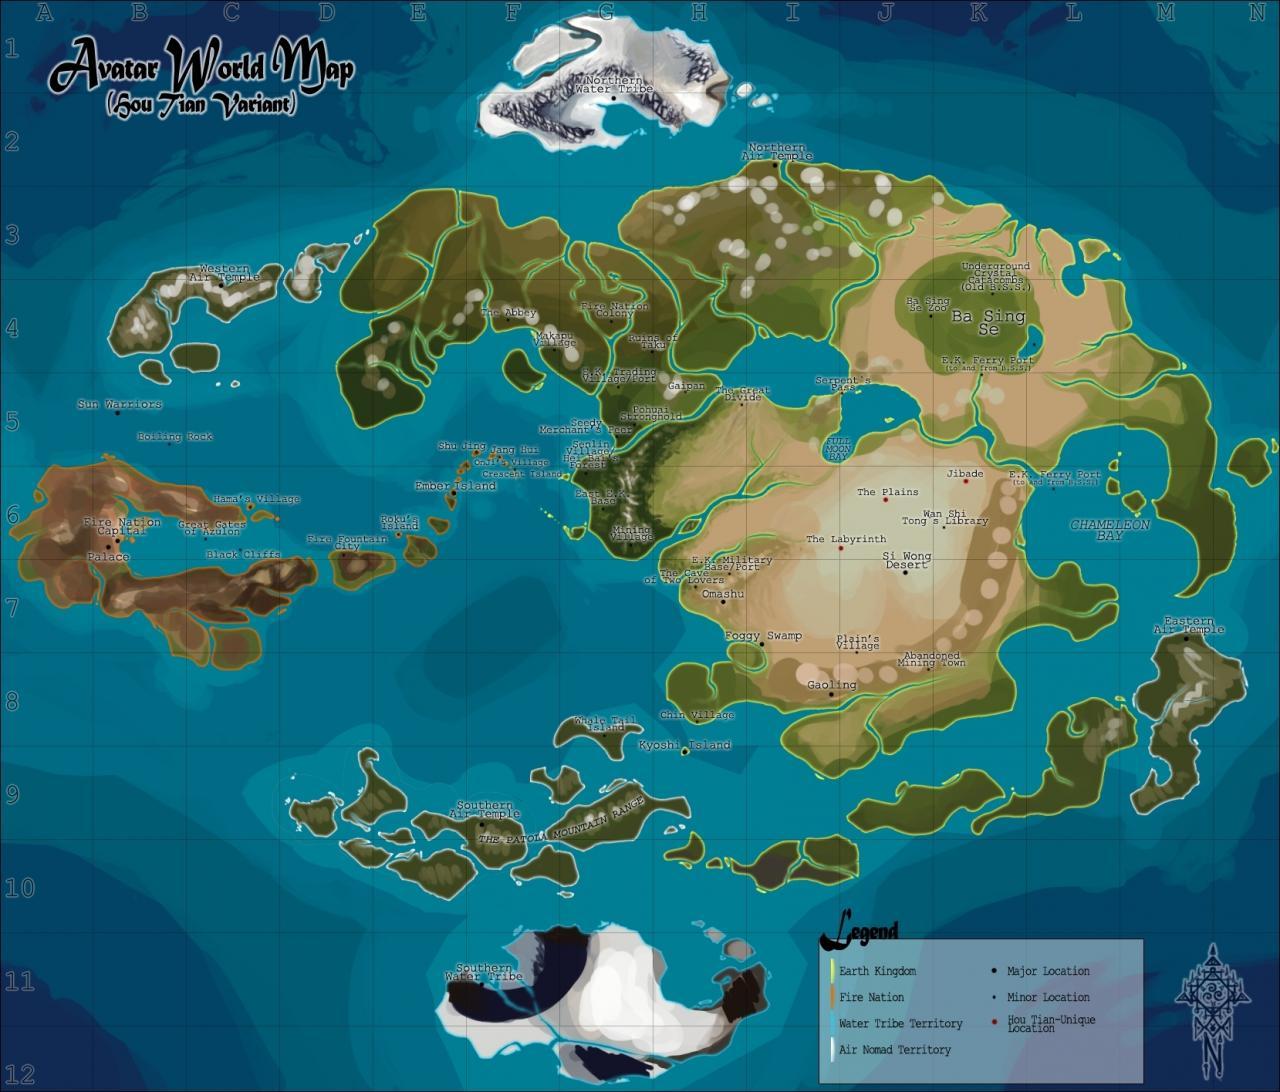 Avatar World Map I am planning on building